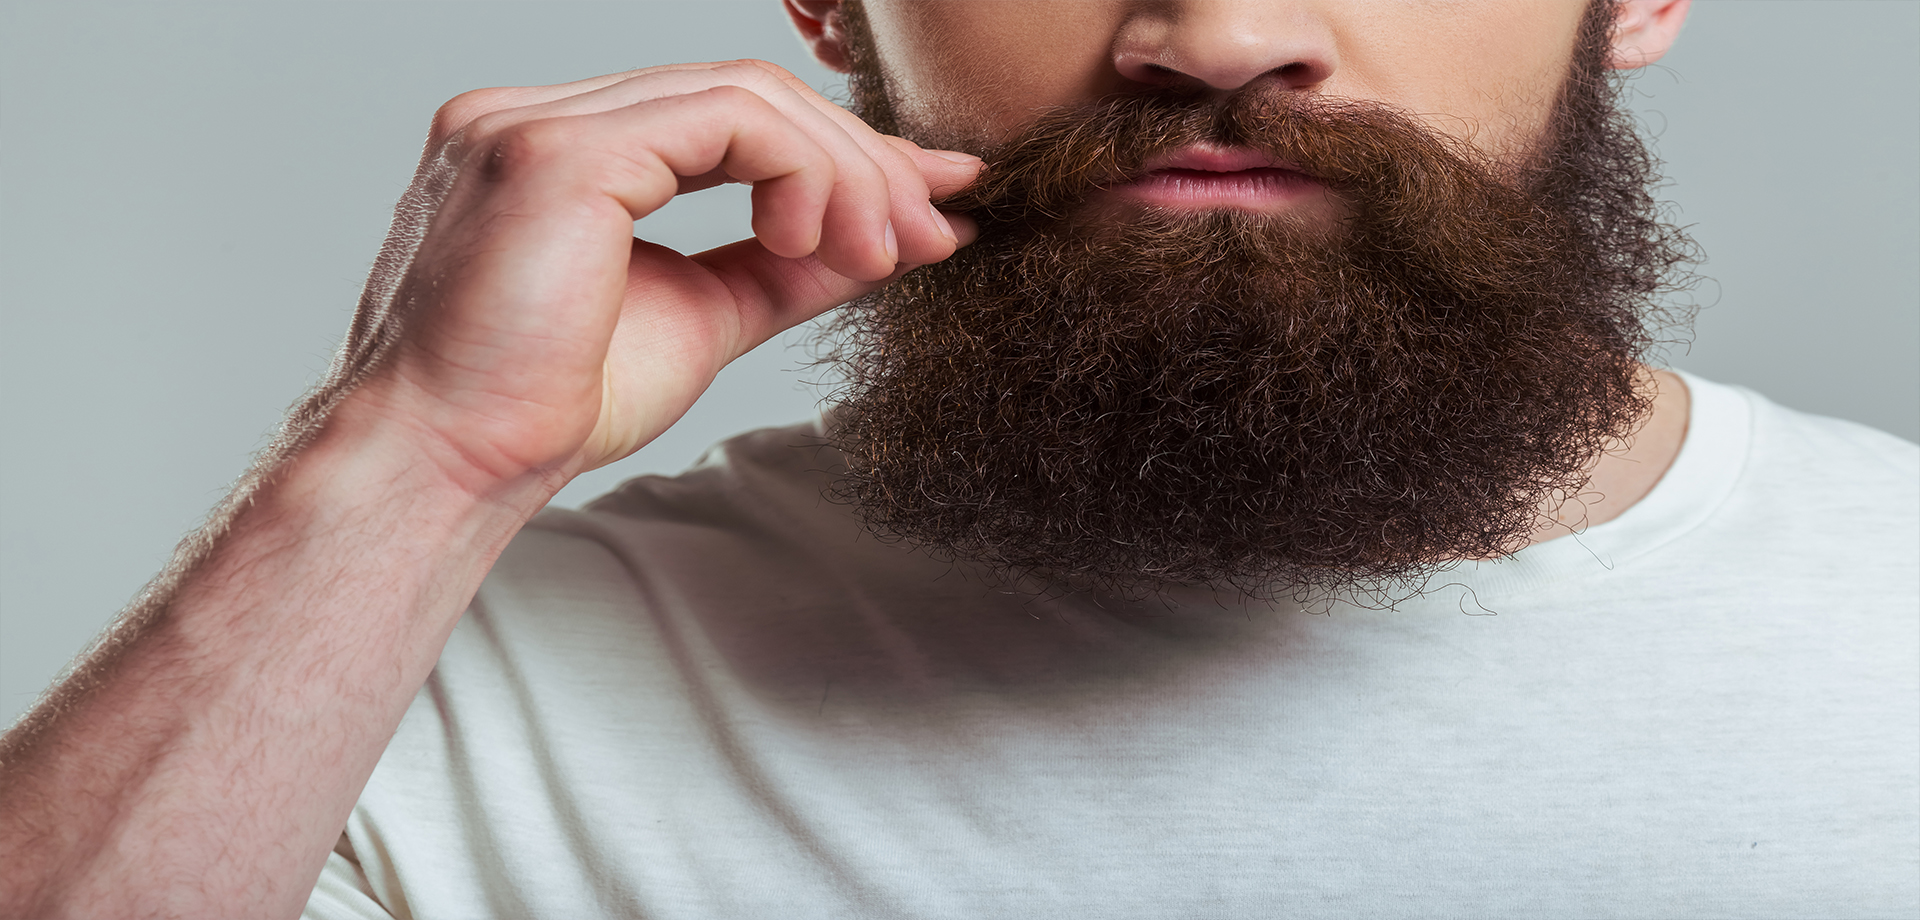 Barba poco poblada